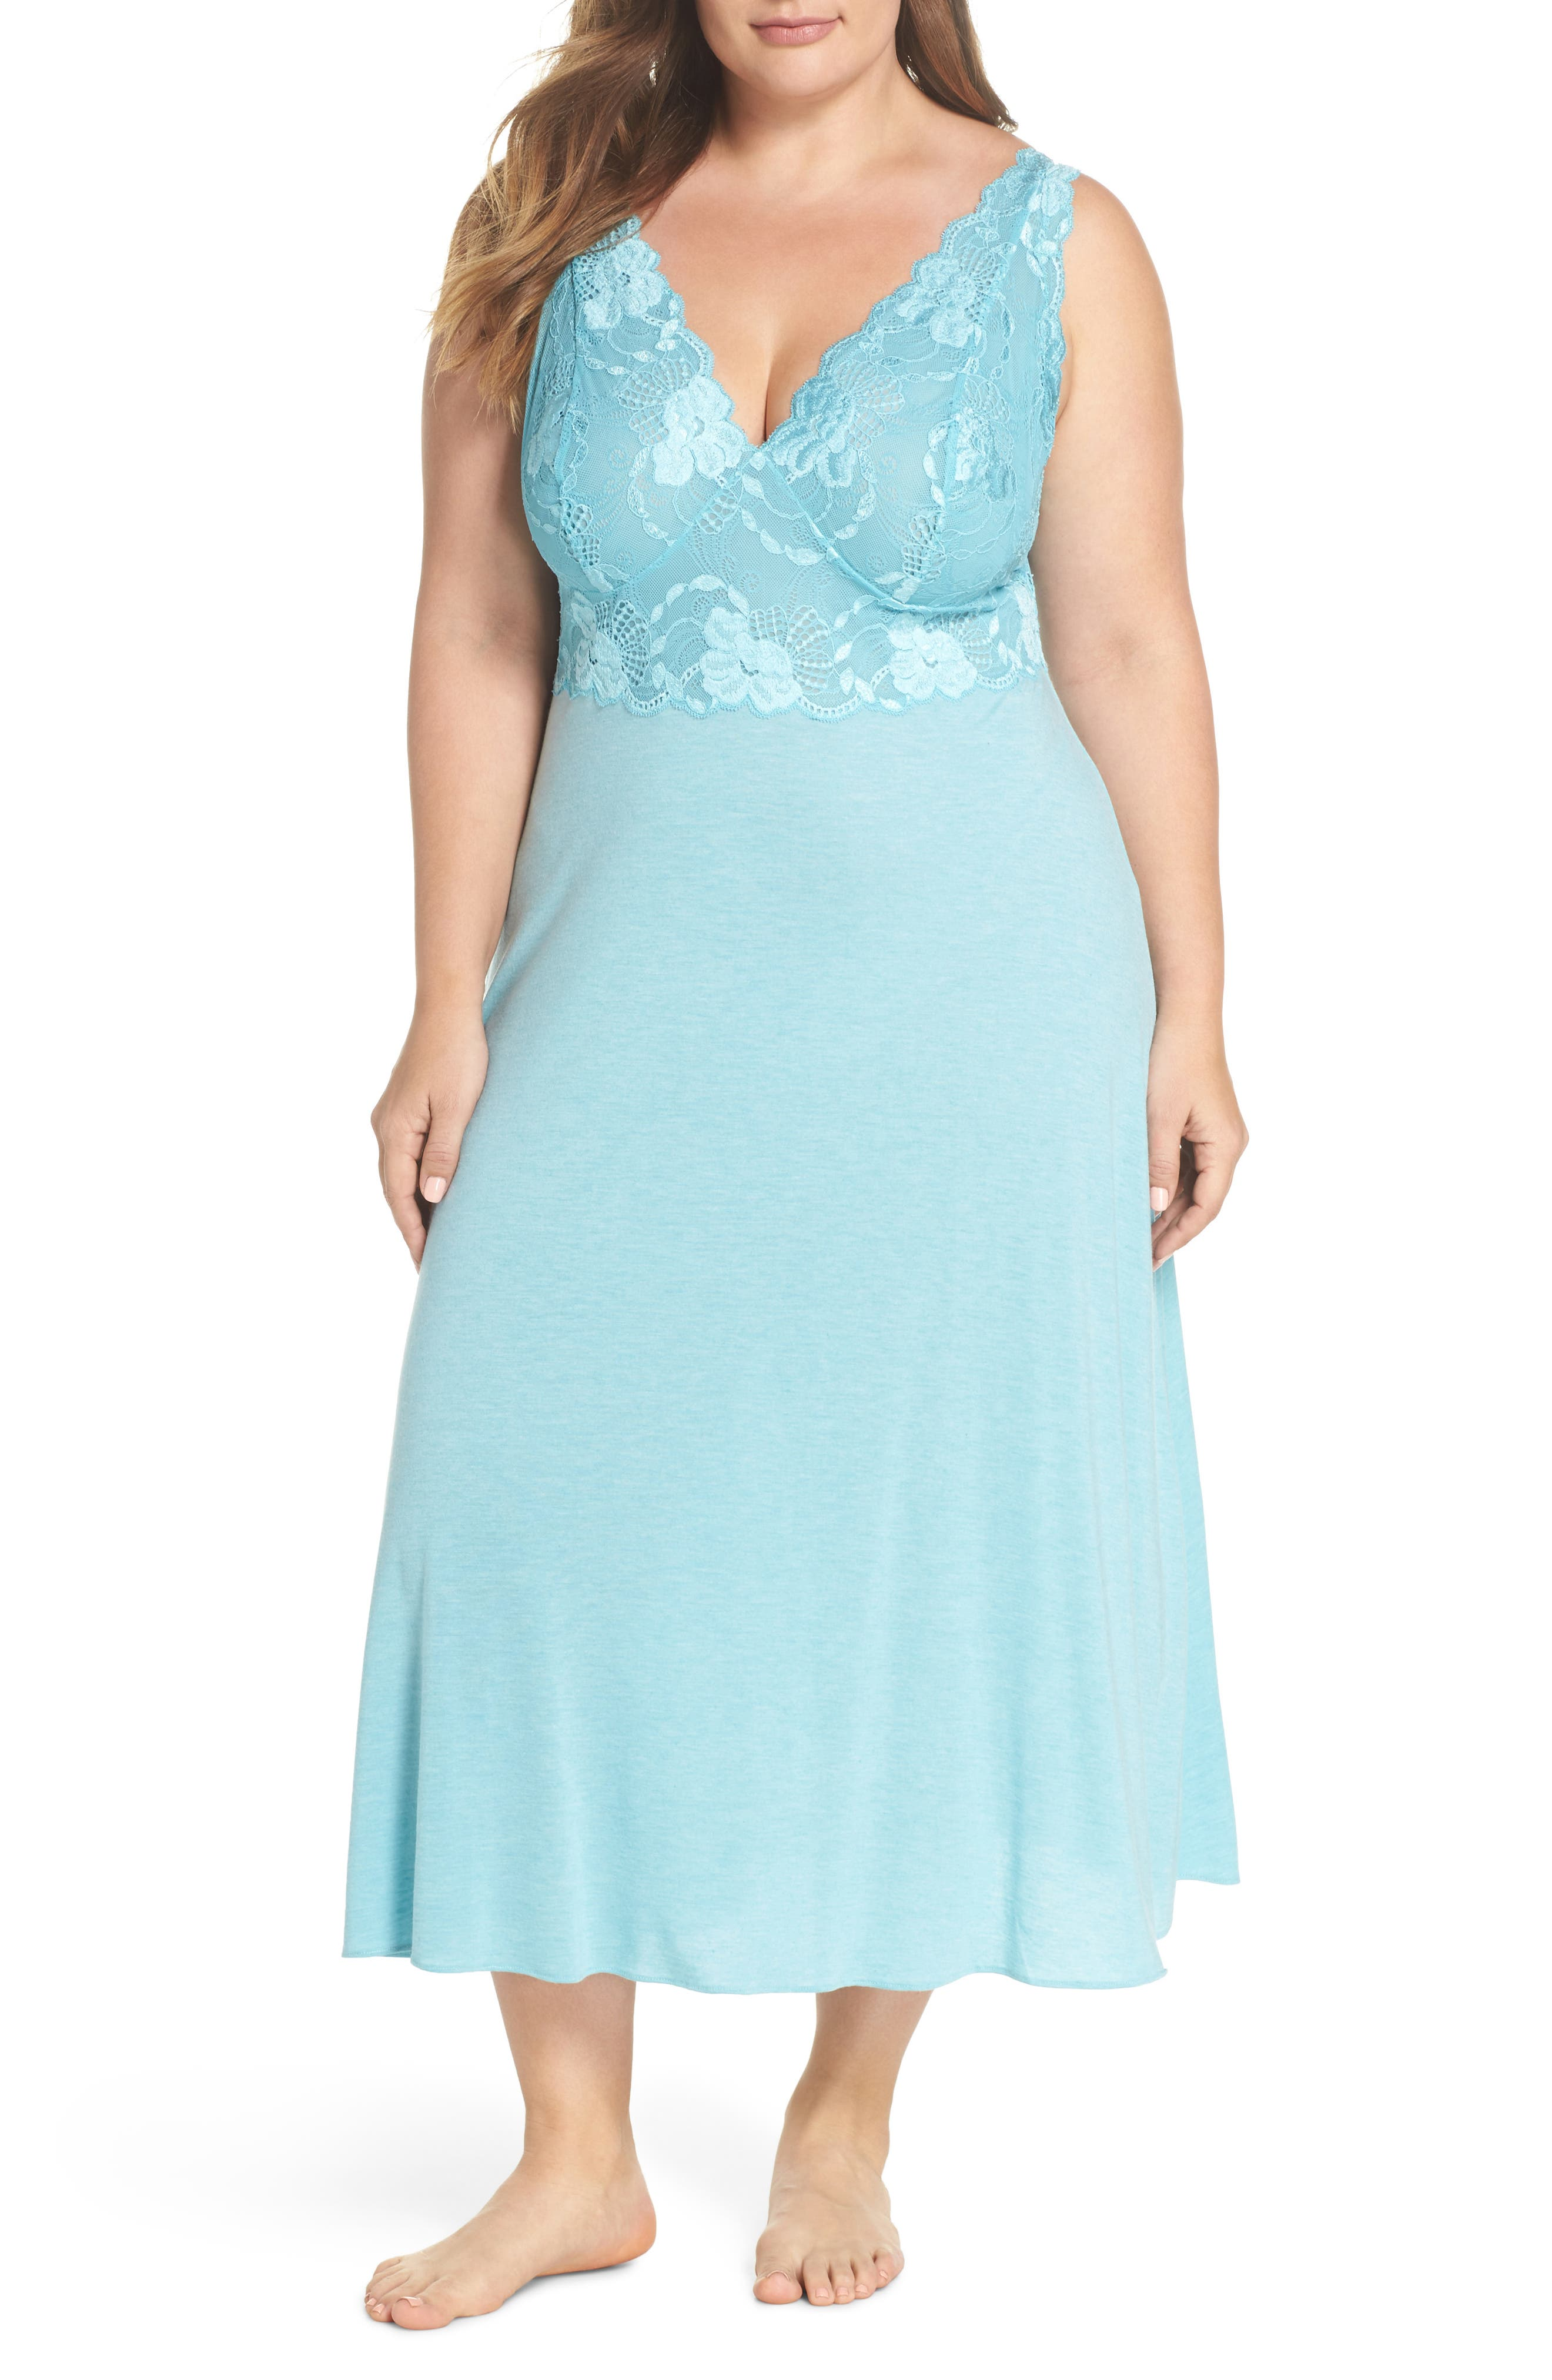 Natori 'Zen Floral' Nightgown (Plus Size)